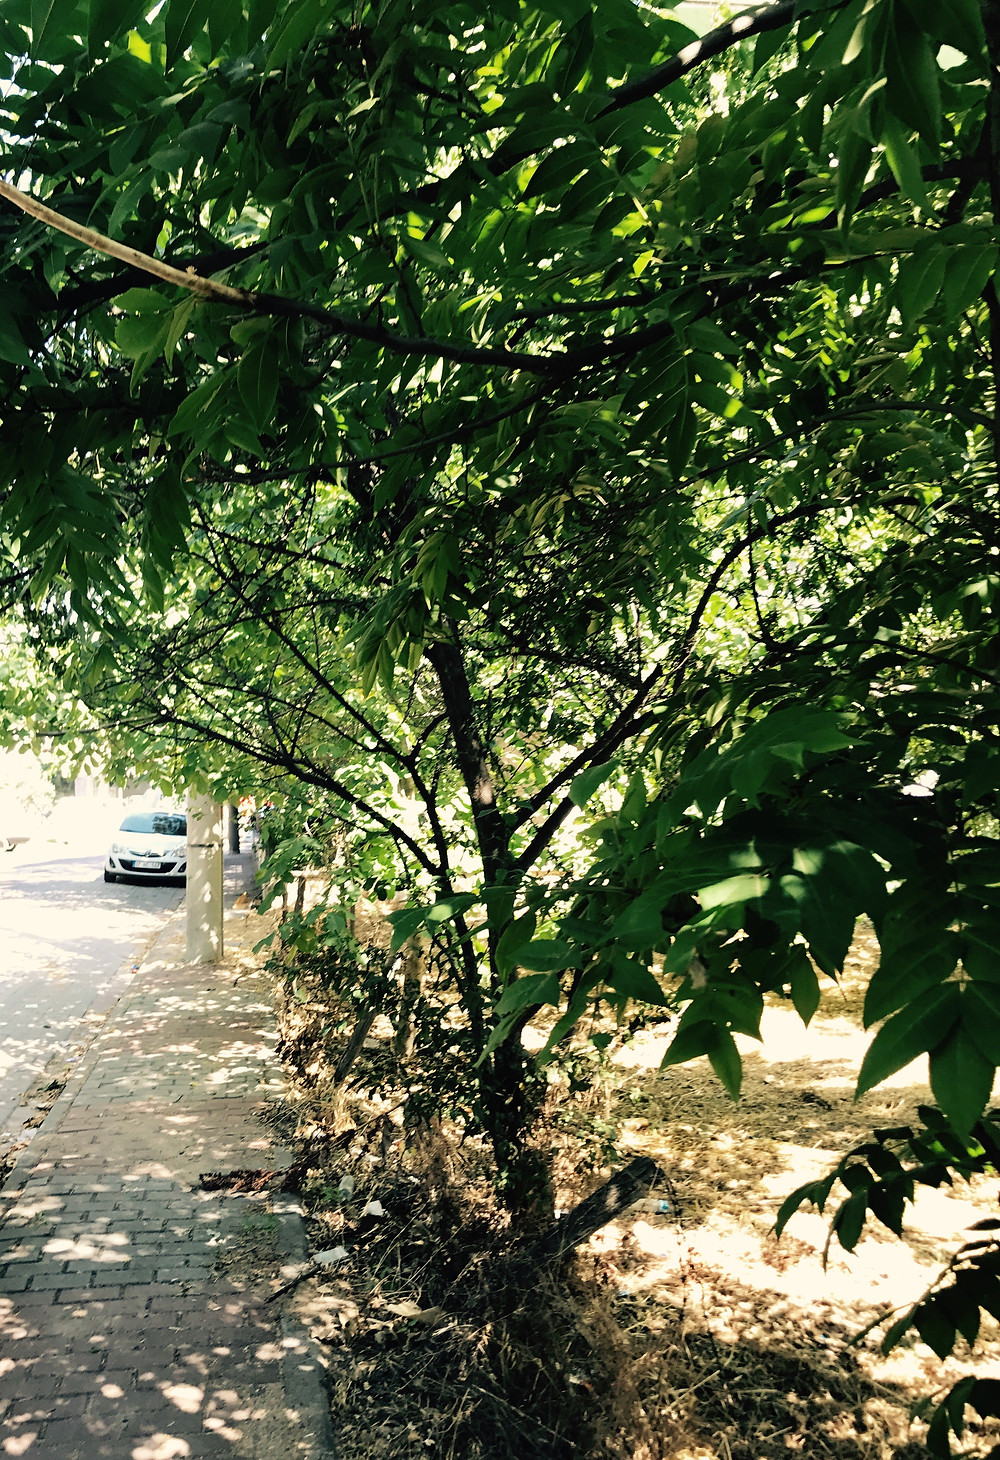 Street in The Artist's current city of residence, Çanakkale, Turkey